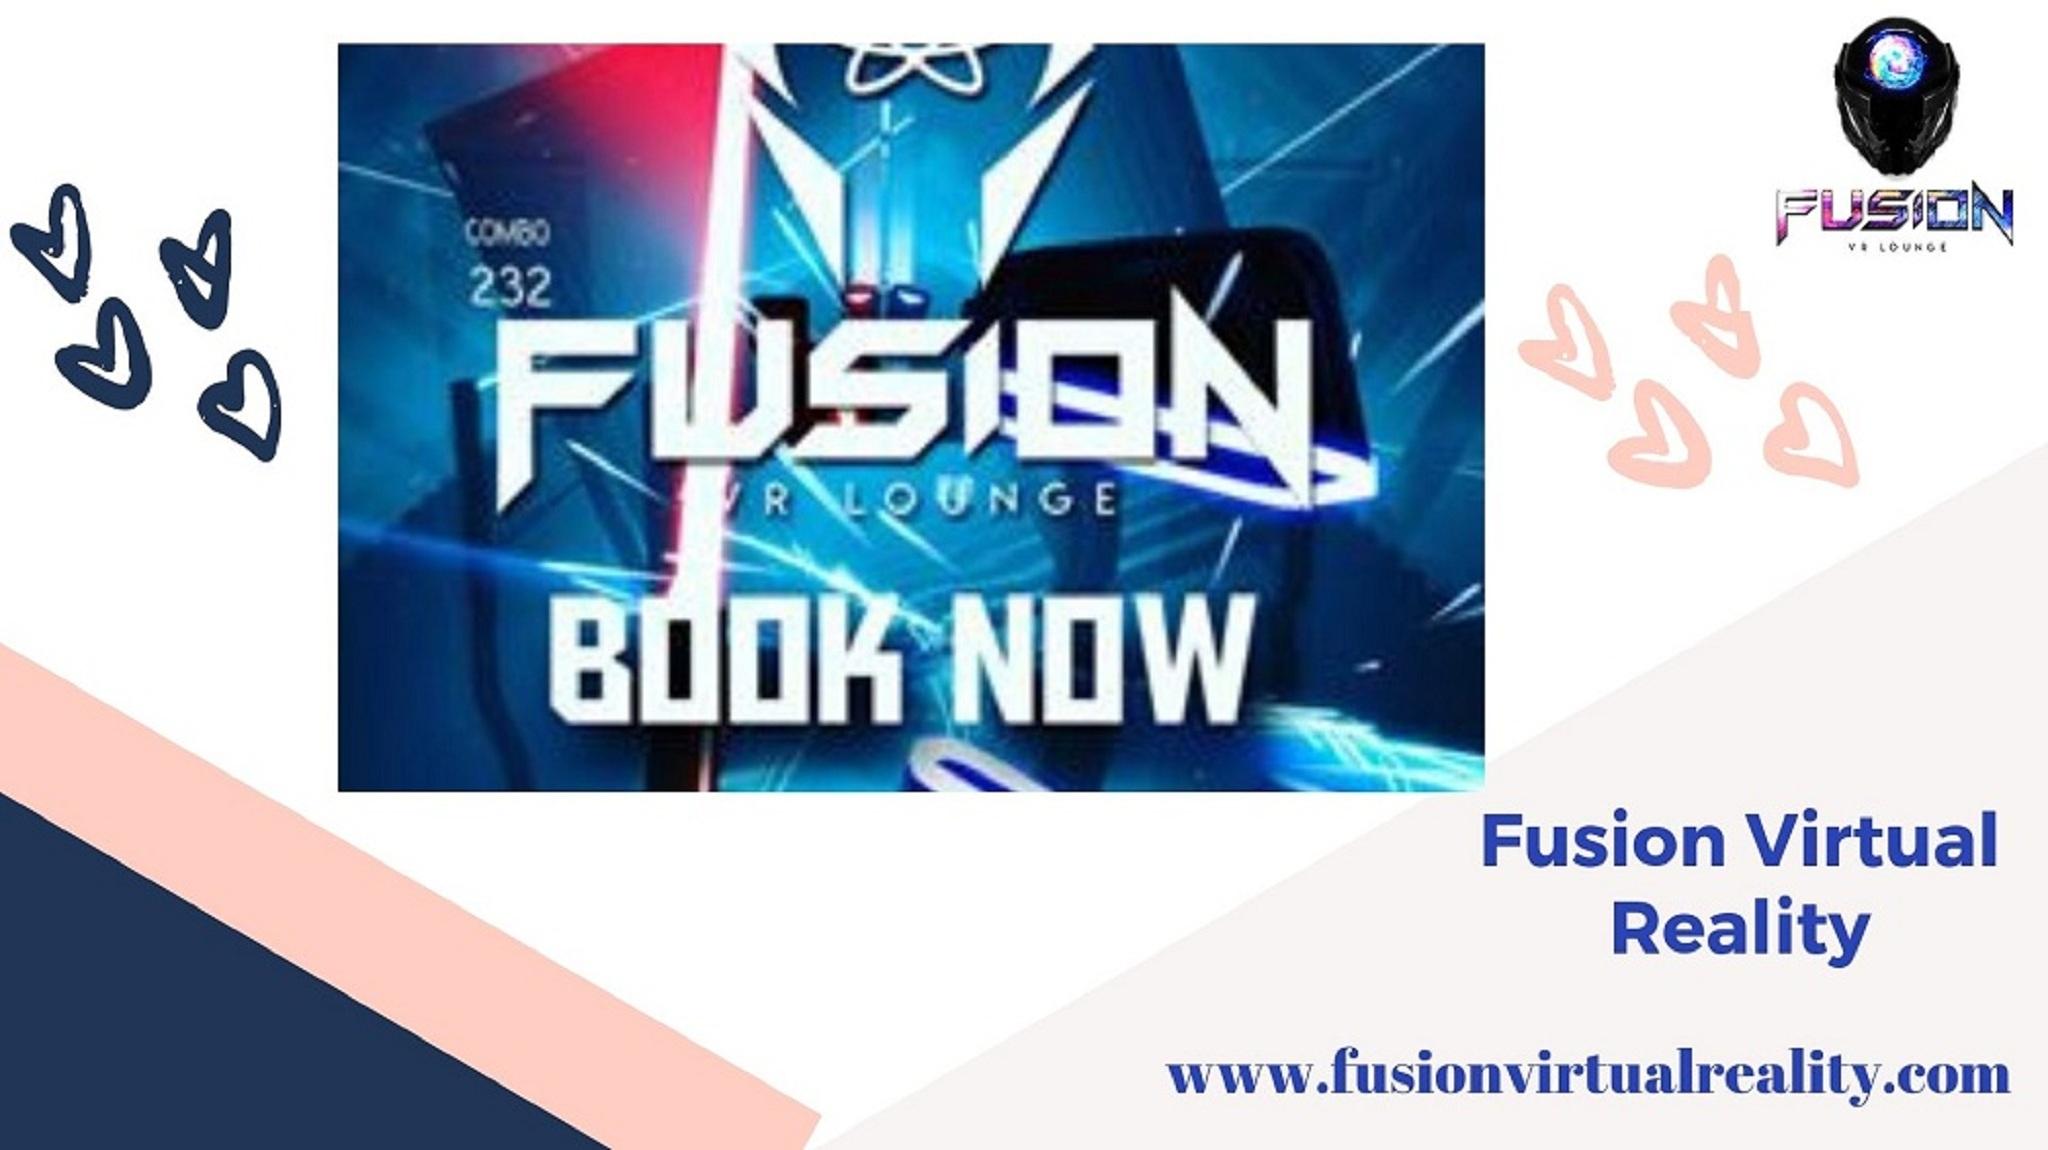 Fusion Virtual Reality (@realityfusionvirtual) Cover Image